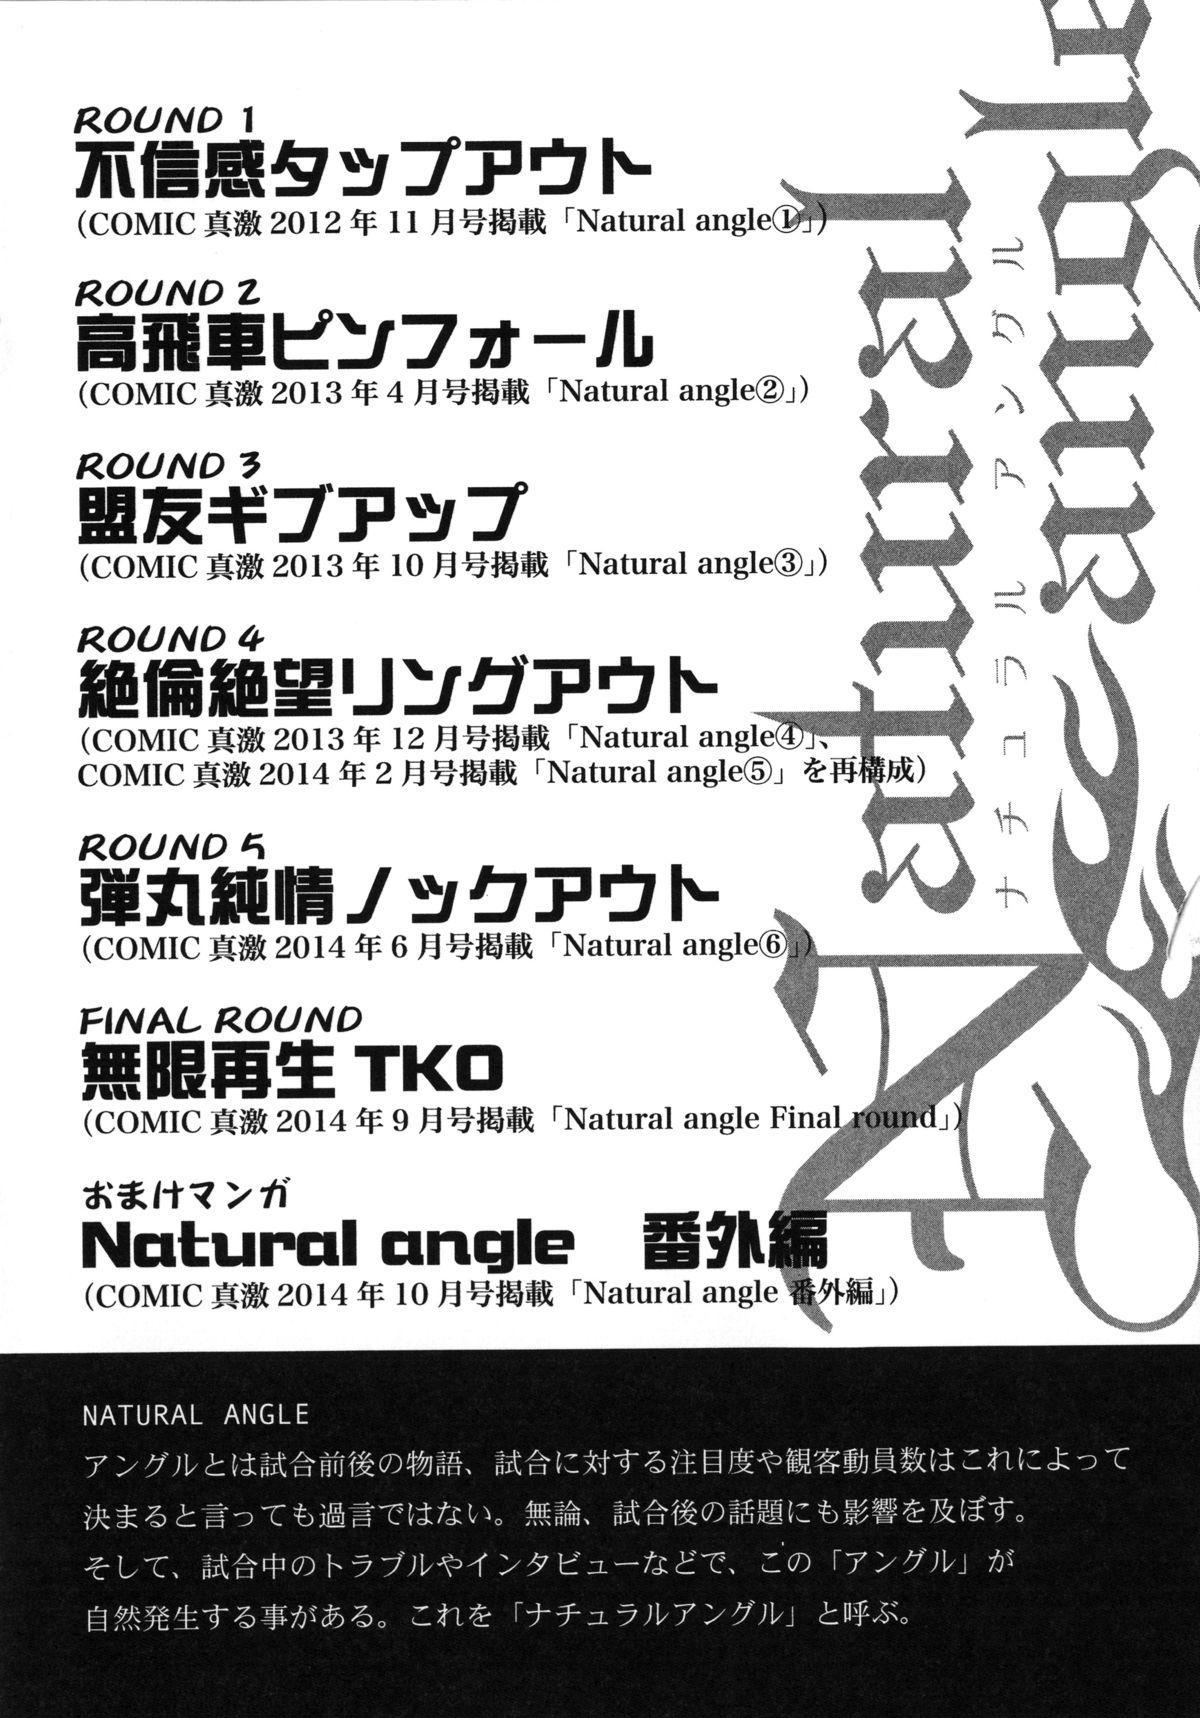 [Yoshimura Tatsumaki] Monzetsu Taigatame ~Count 3 de Ikasete Ageru~ | Faint in Agony Bodylock ~I'll make you cum on the count of 3~ Ch. 1 [English] [Brolen+drozetta] 12